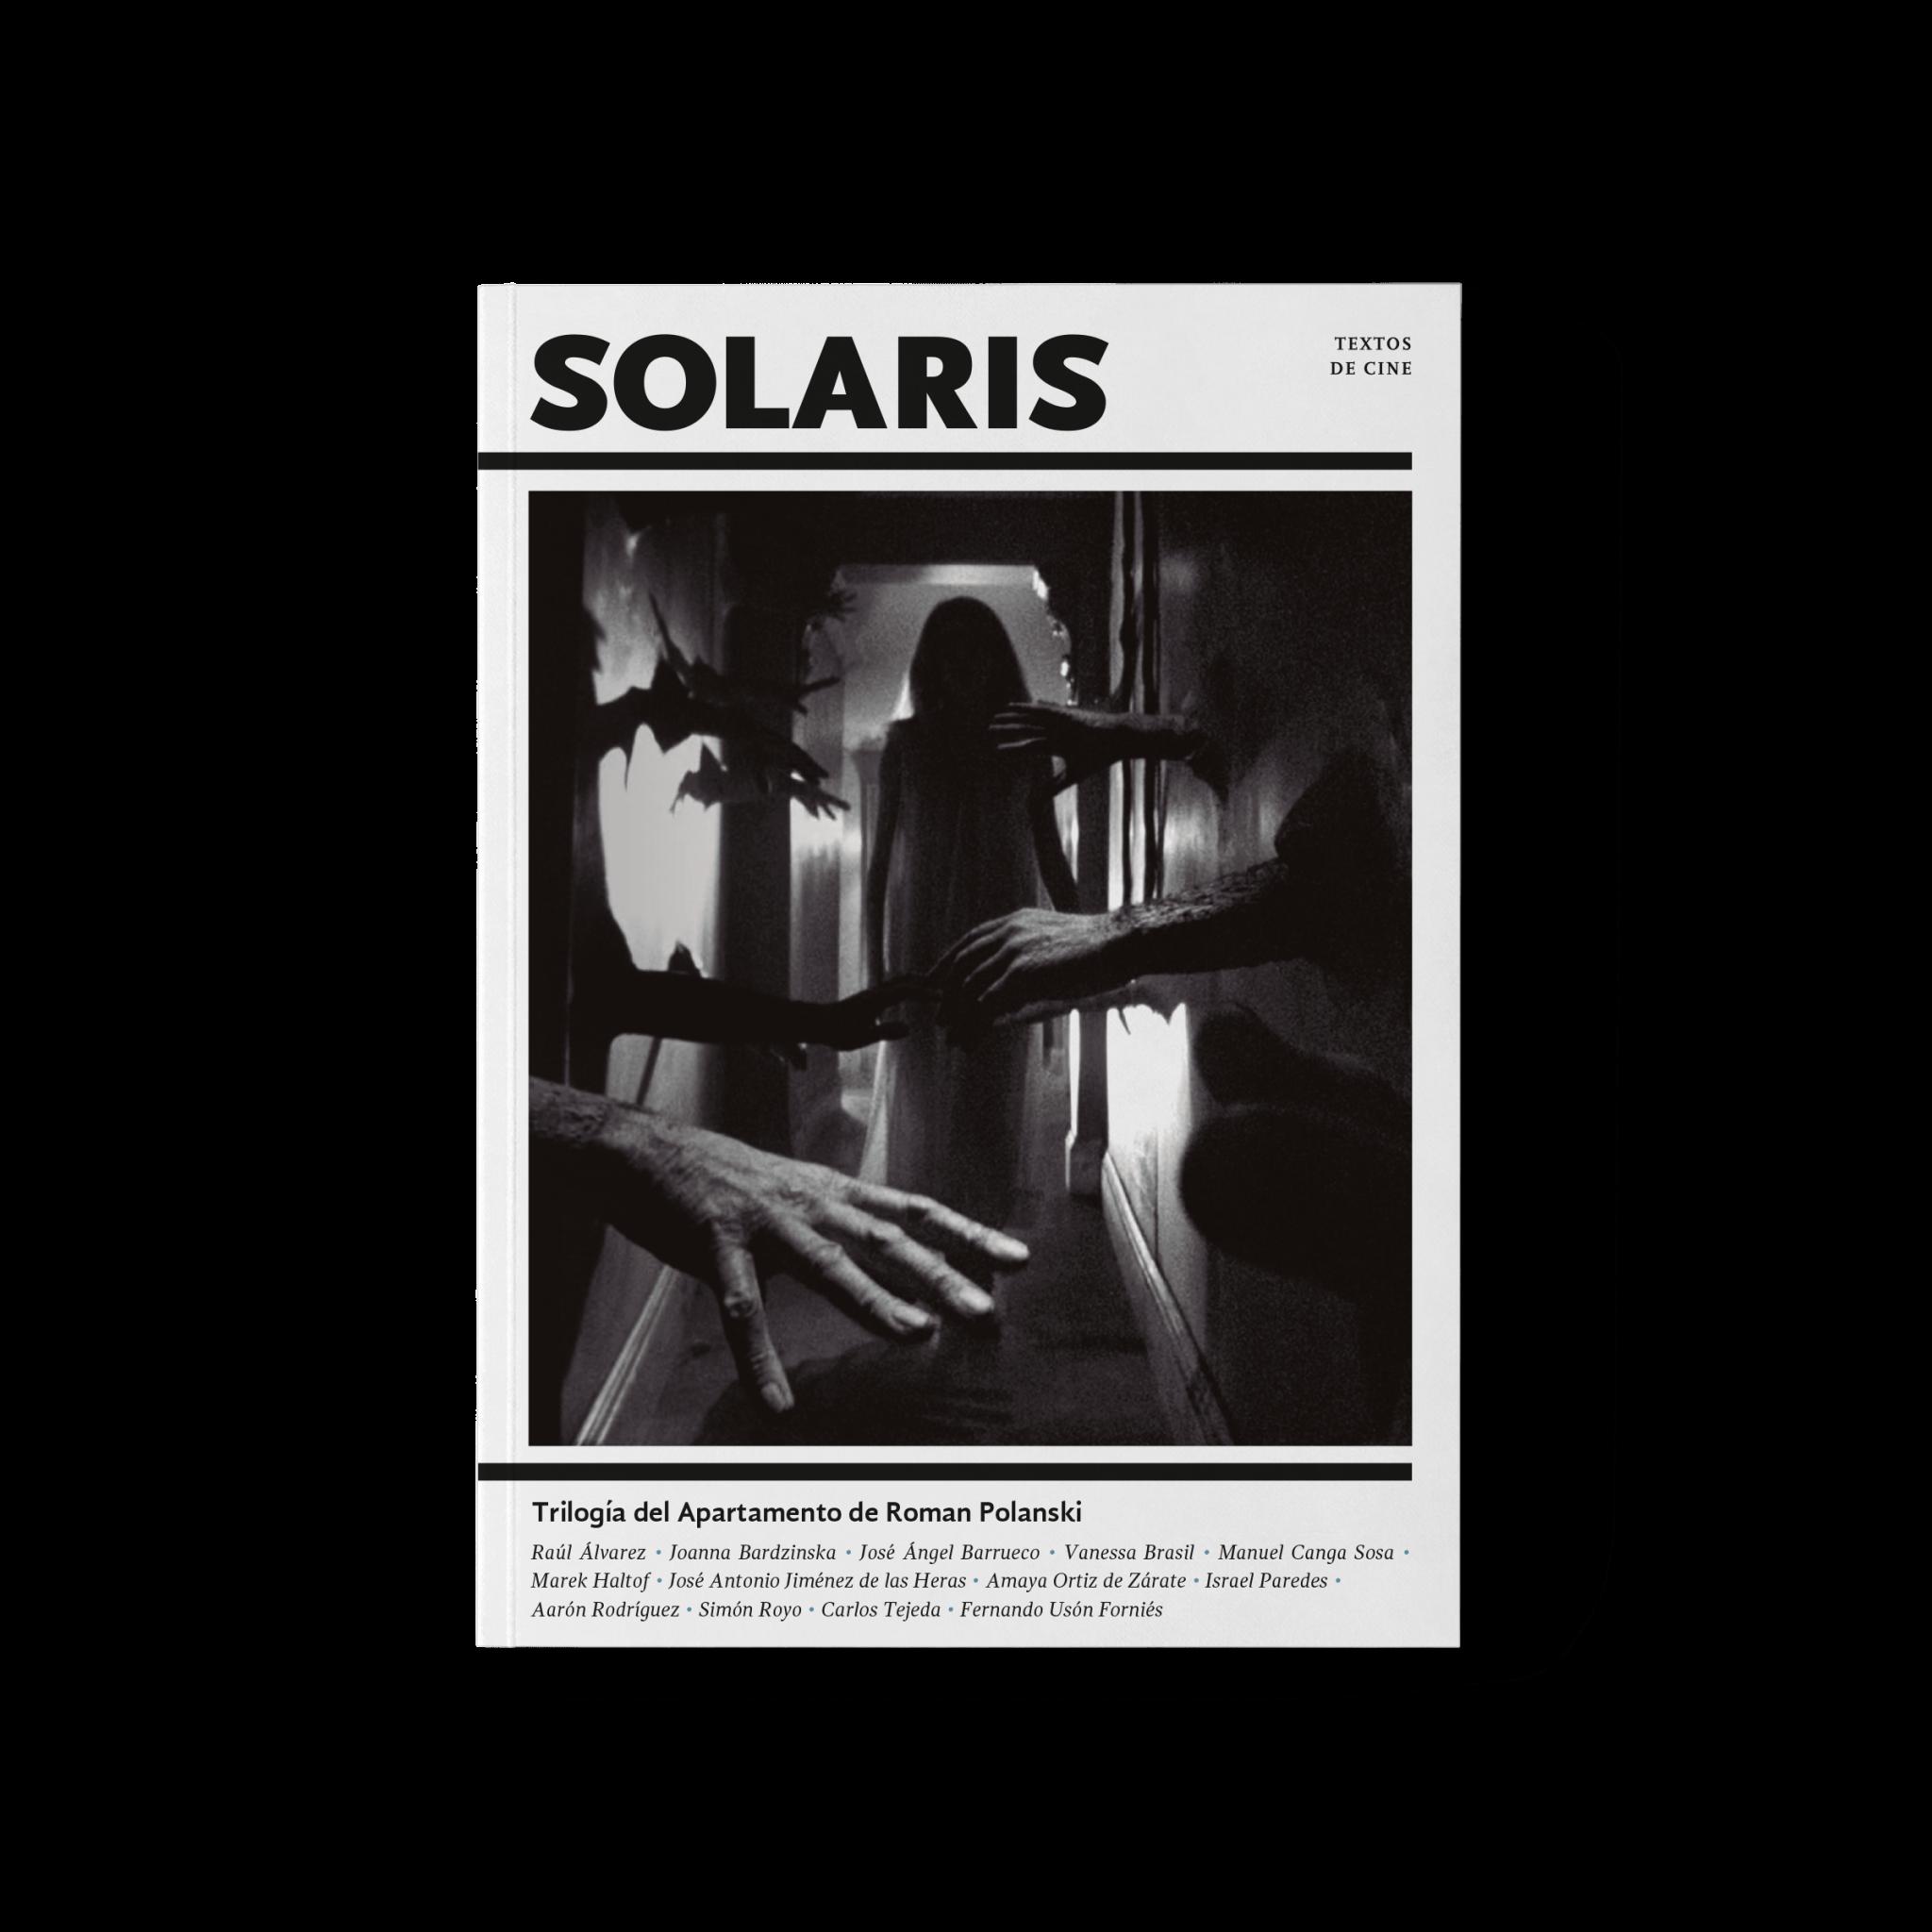 Trilogía del Apartamento de Roman Polanski - Solaris, Textos de Cine